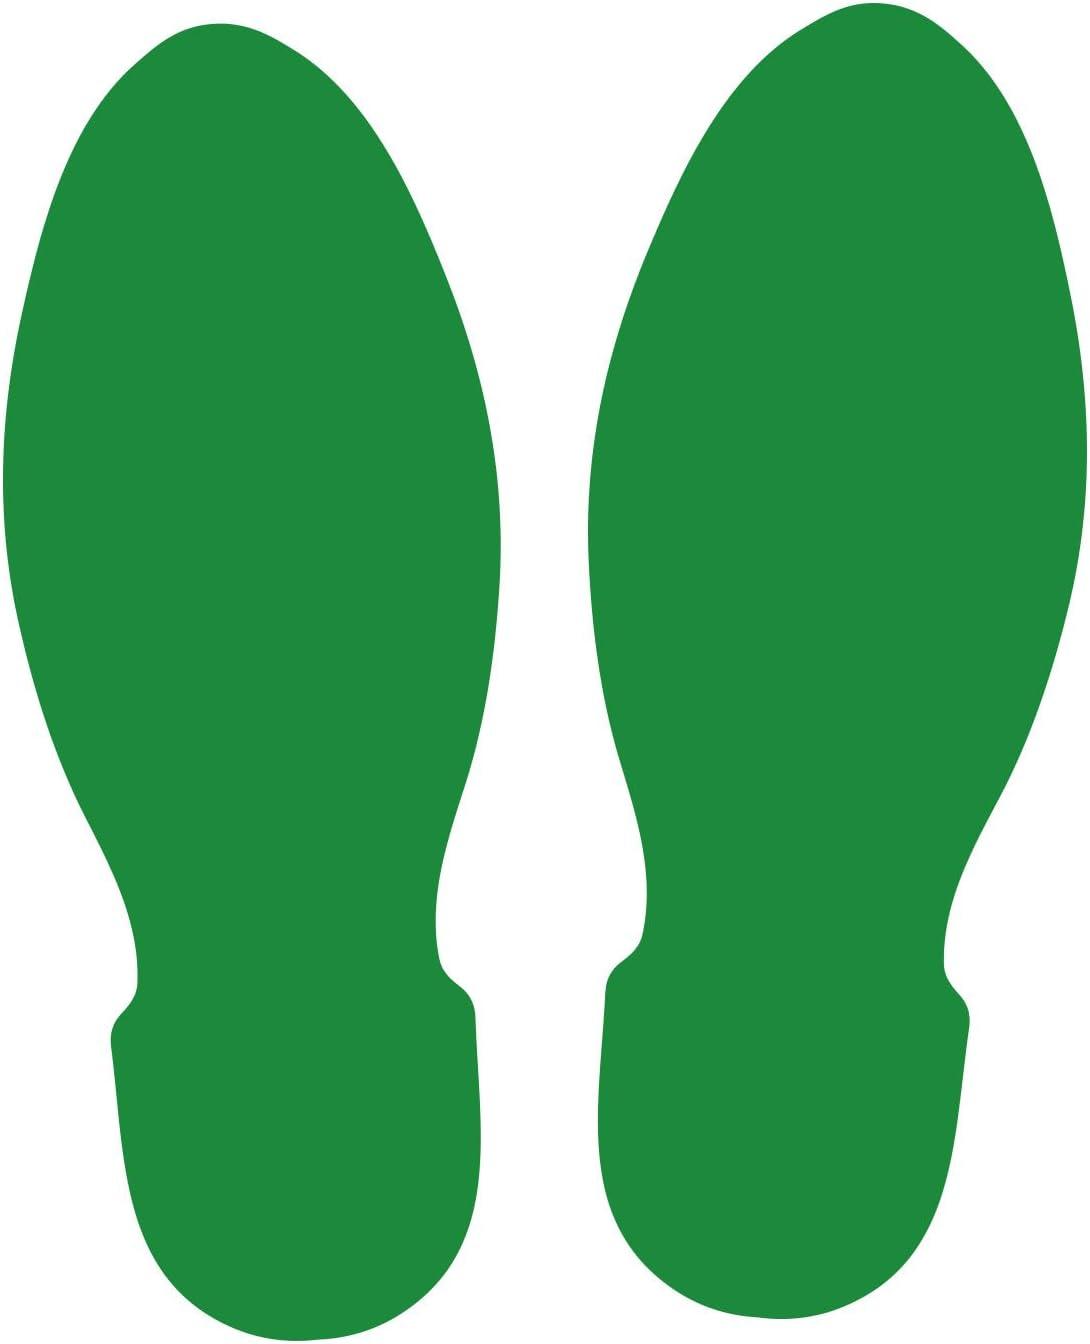 LiteMark 9.7 Inch 超歓迎された Grass Green Stickers Footprint for 割り引き Floors Safe